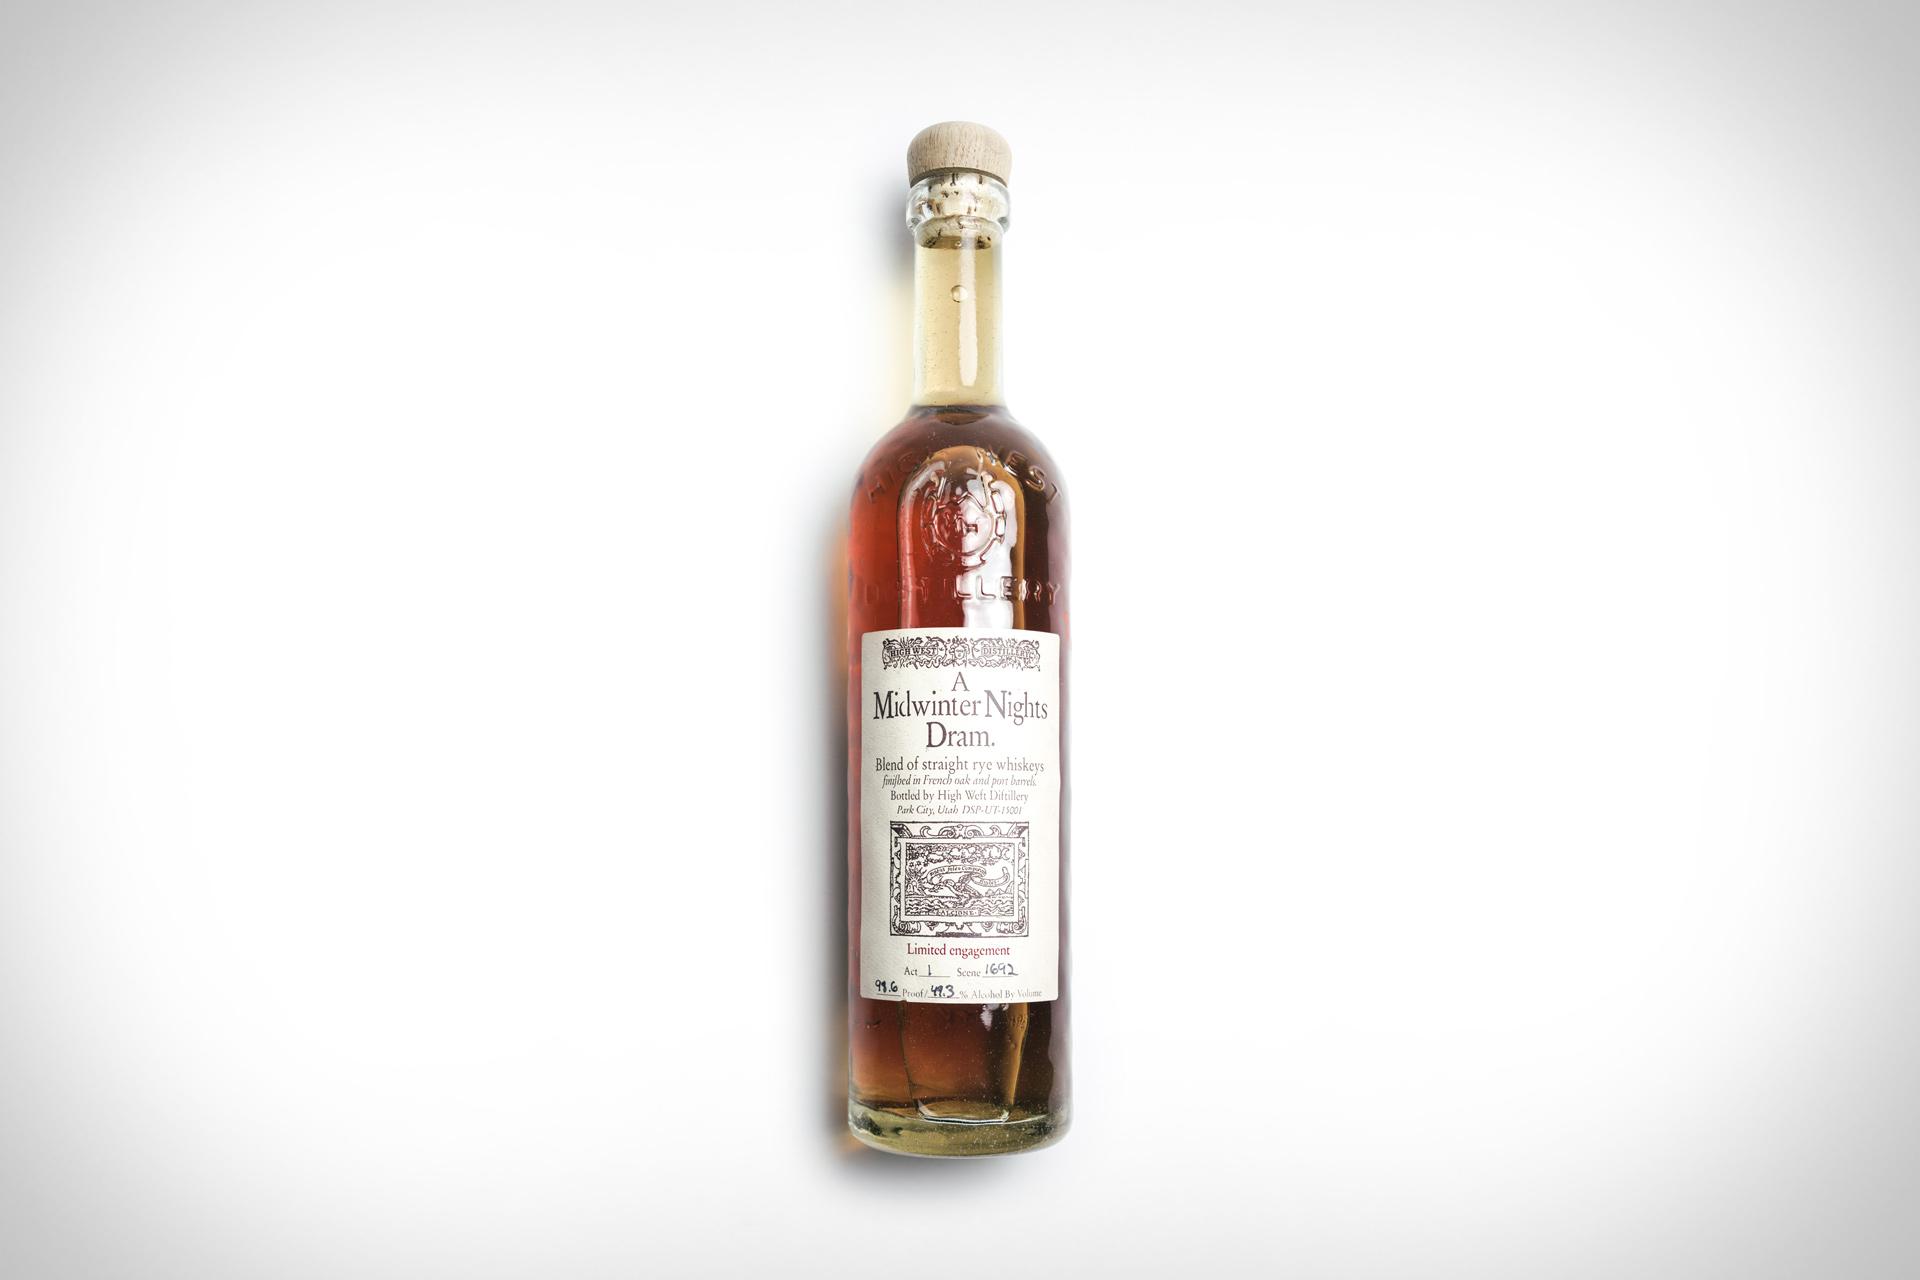 A Midwinter Night's Dram Whiskey